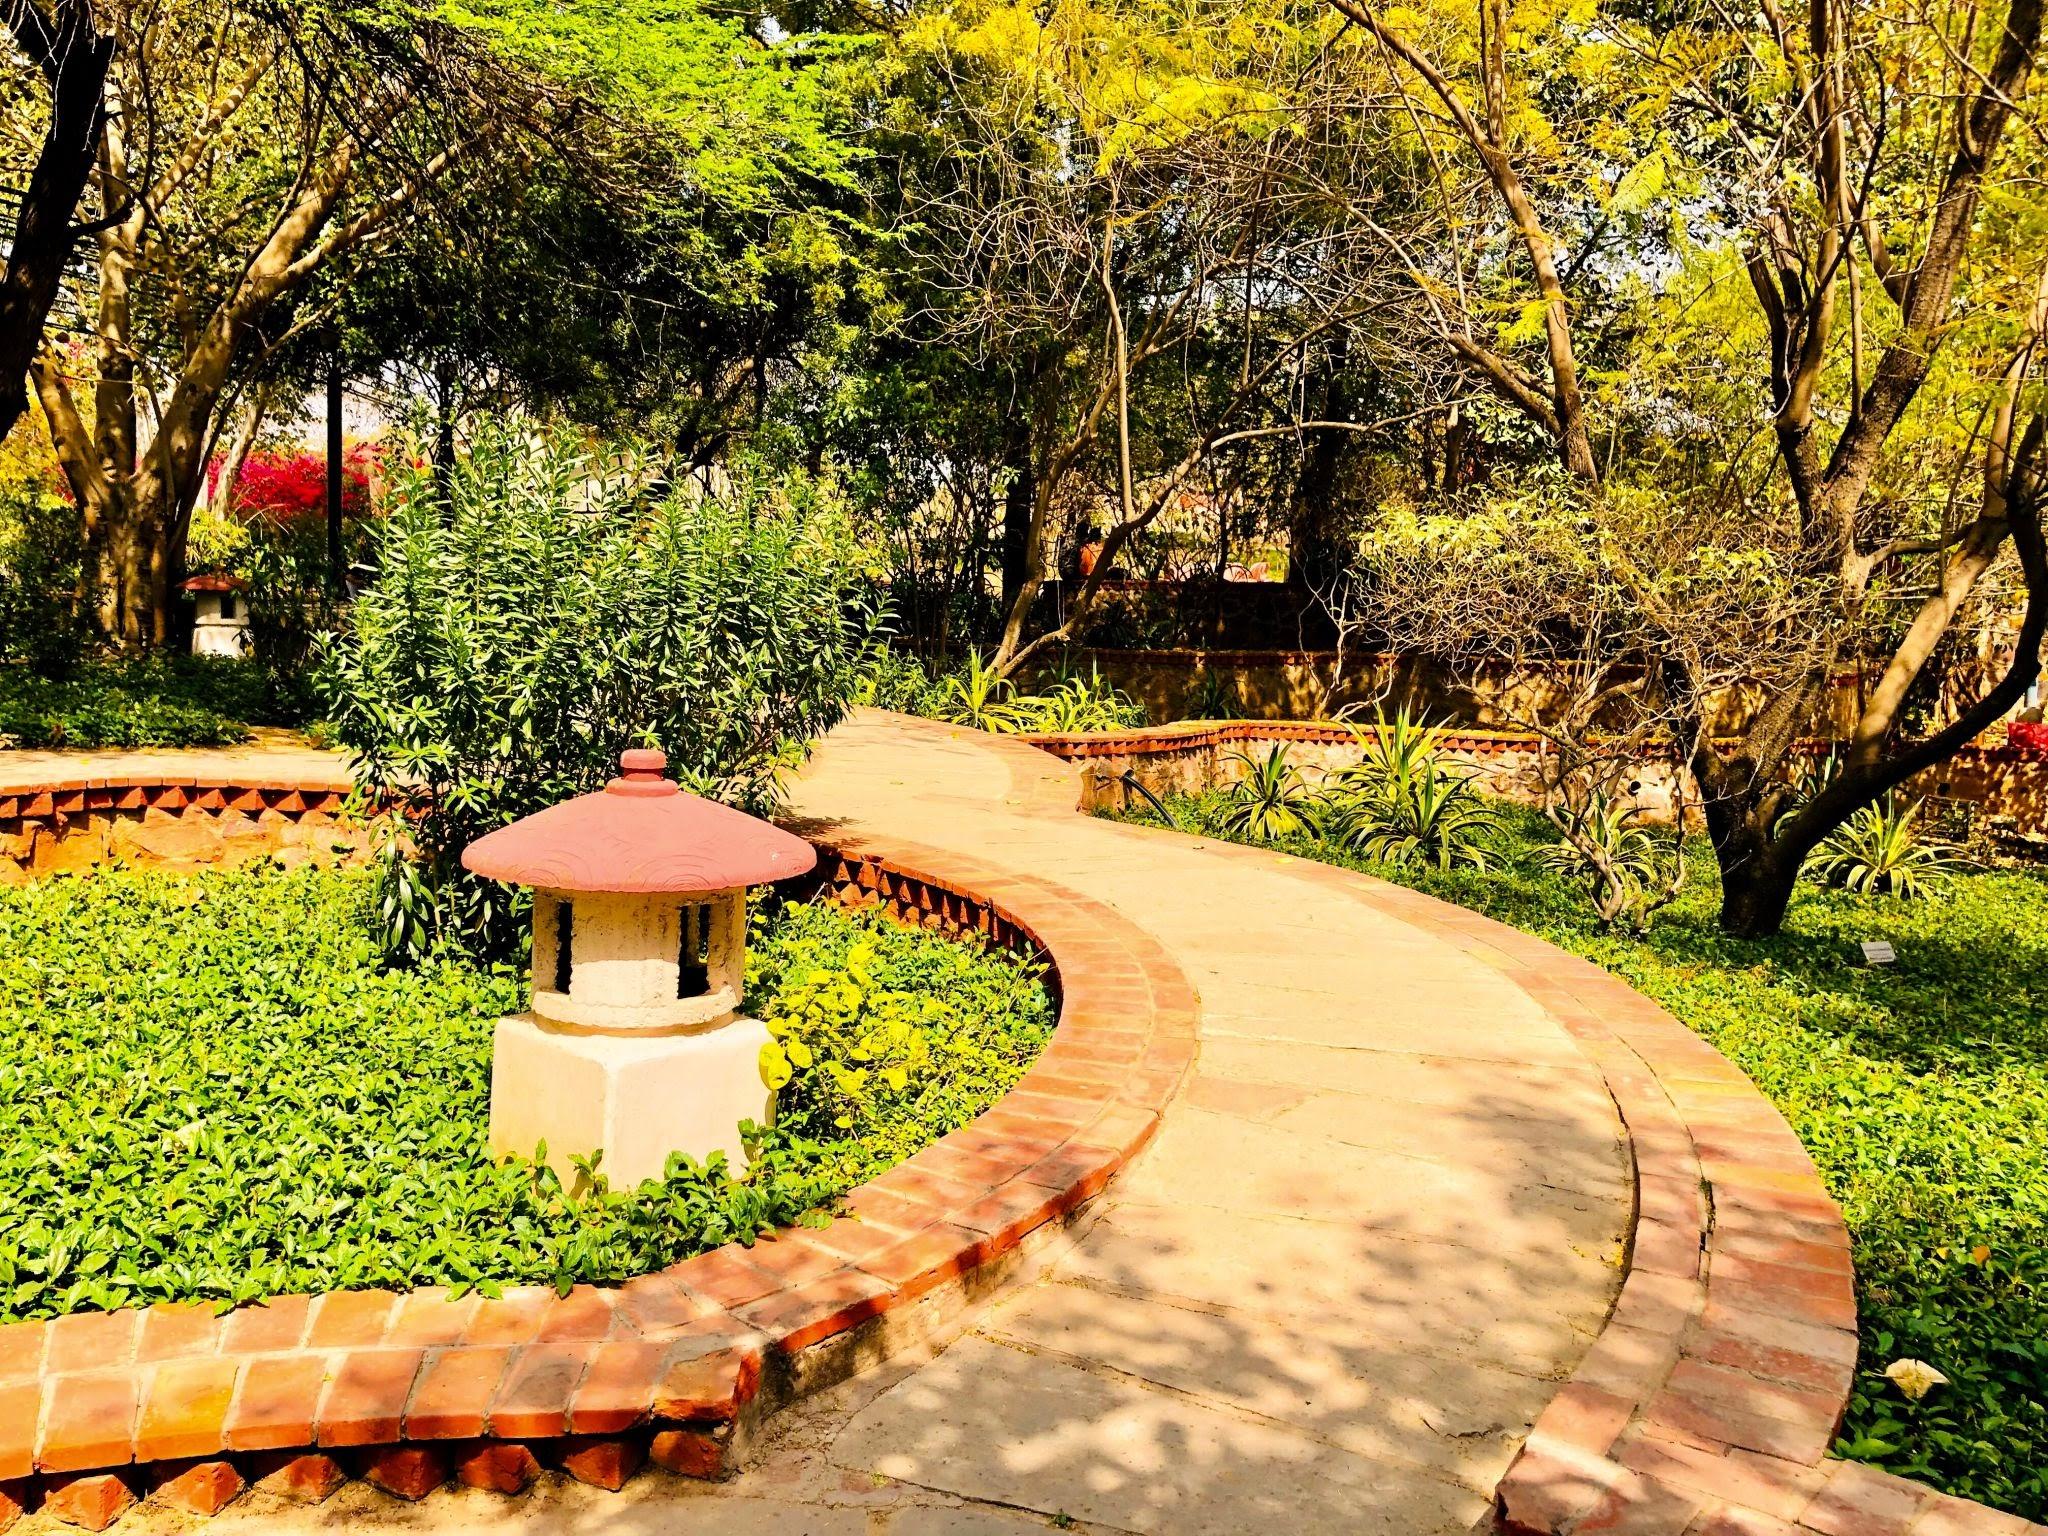 The Garden of Five Senses